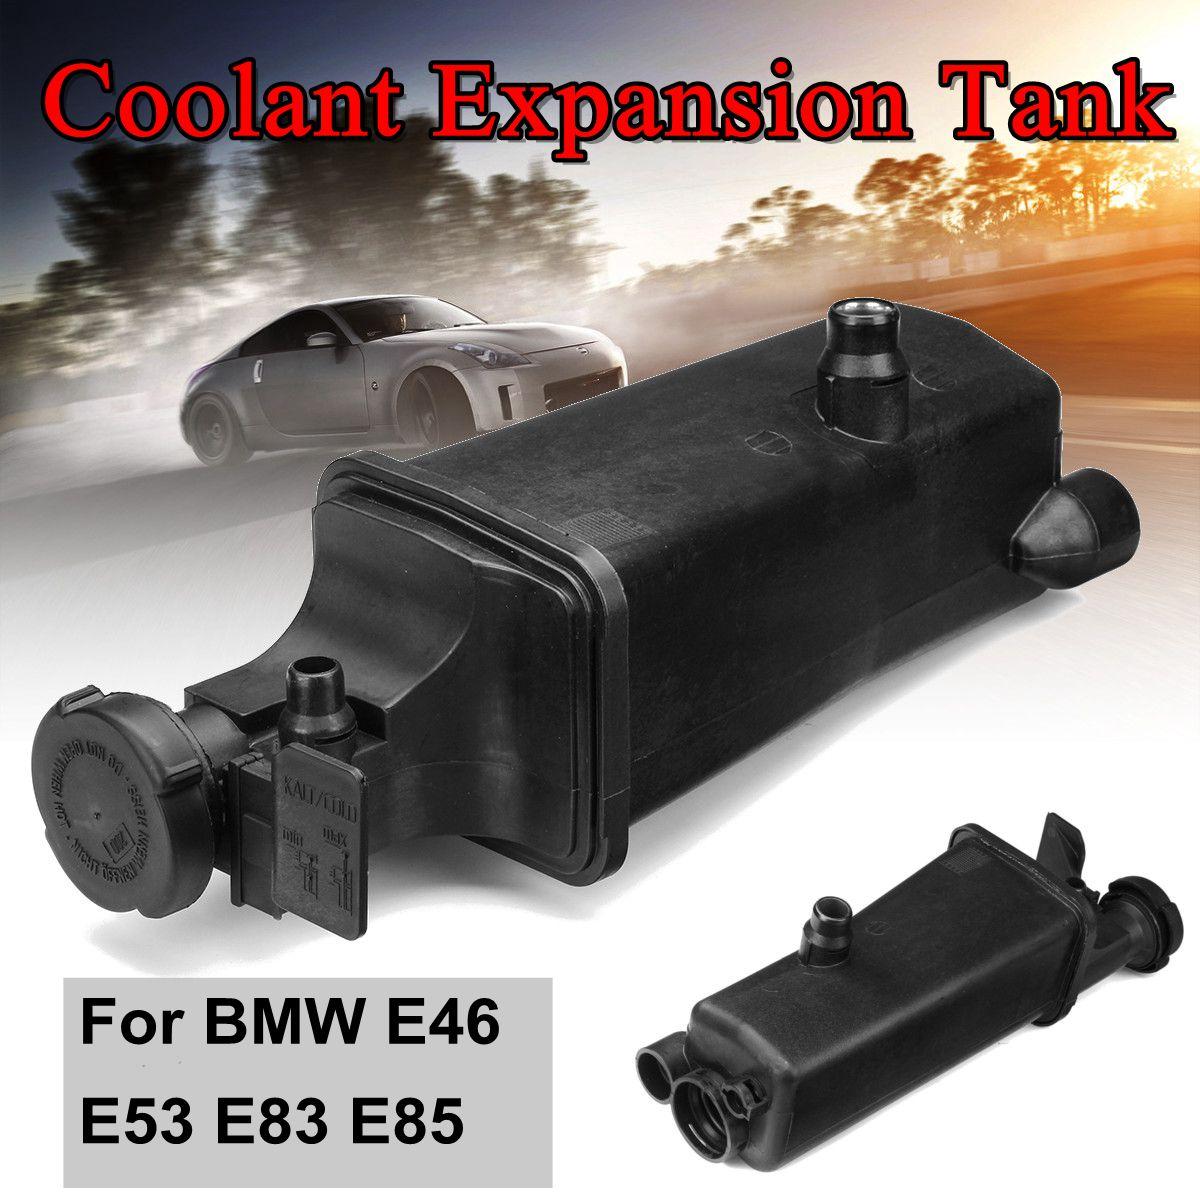 Auto Kühler Kühlmittel Überlauf Expansion Tank mit Kappe 17117573781 Für BMW E46 E53 E83 E85